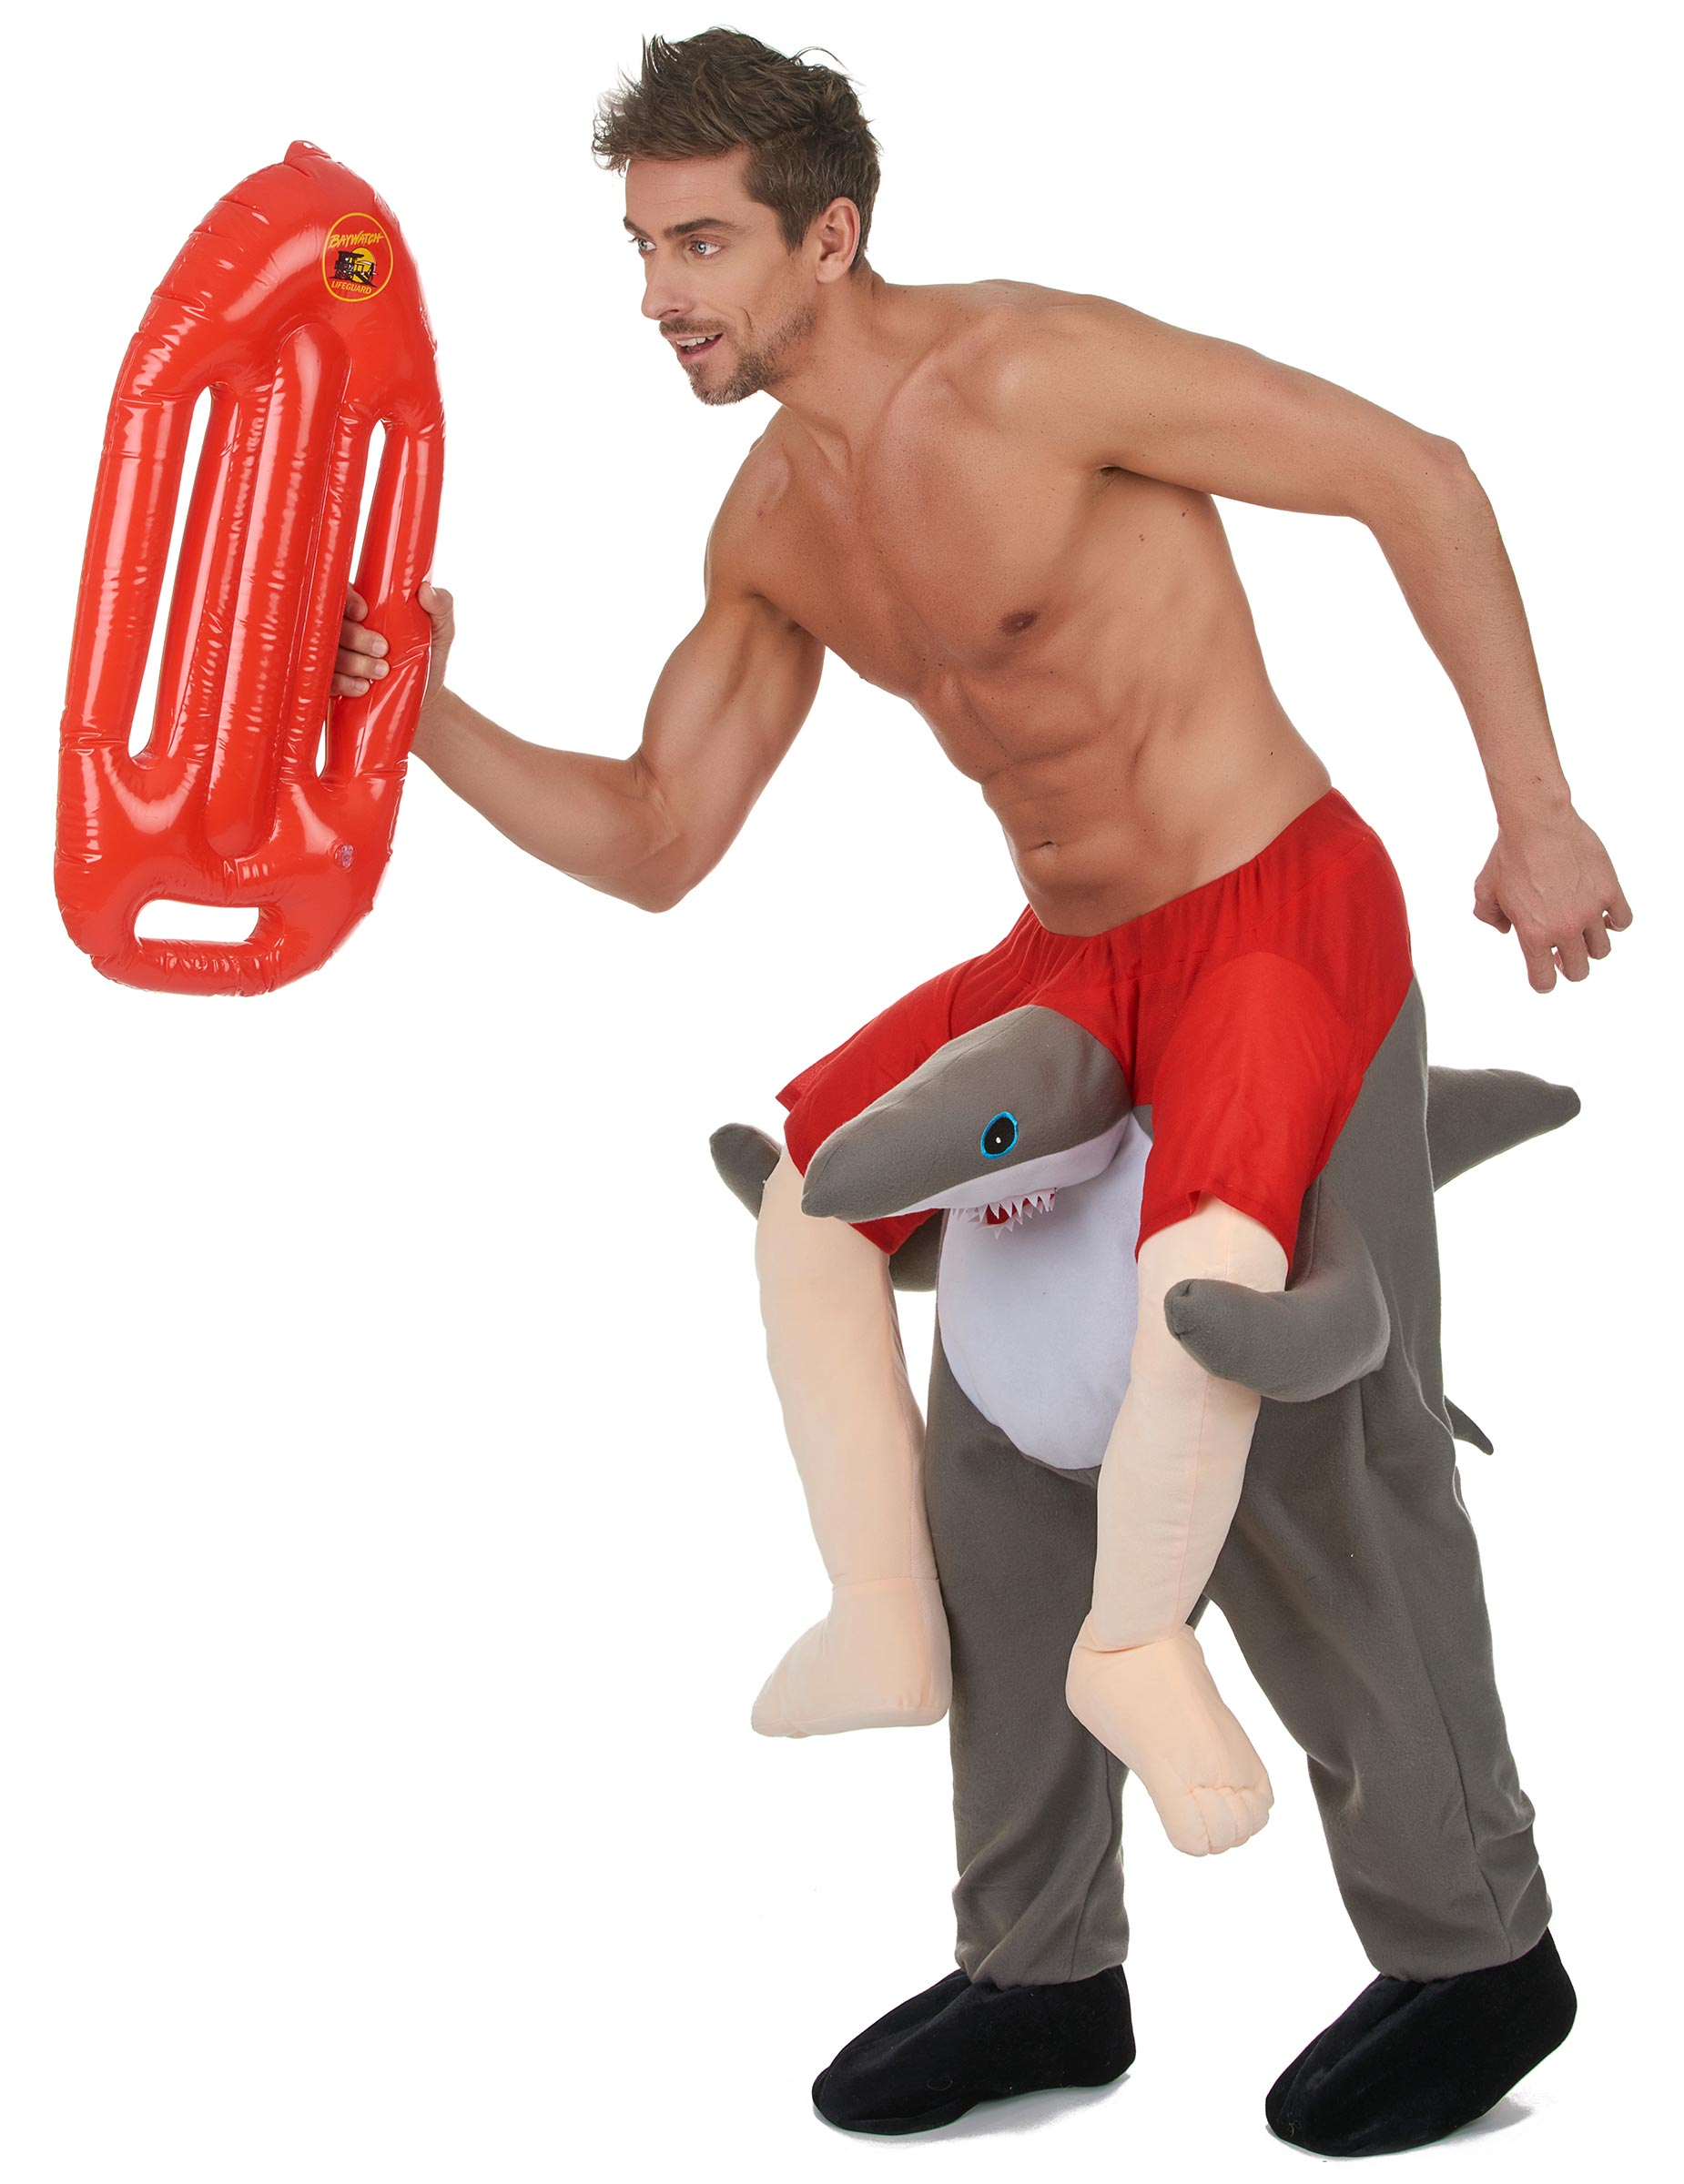 Haifisch Surfer Kostum Grau Rot Weiss Gunstige Faschings Kostume